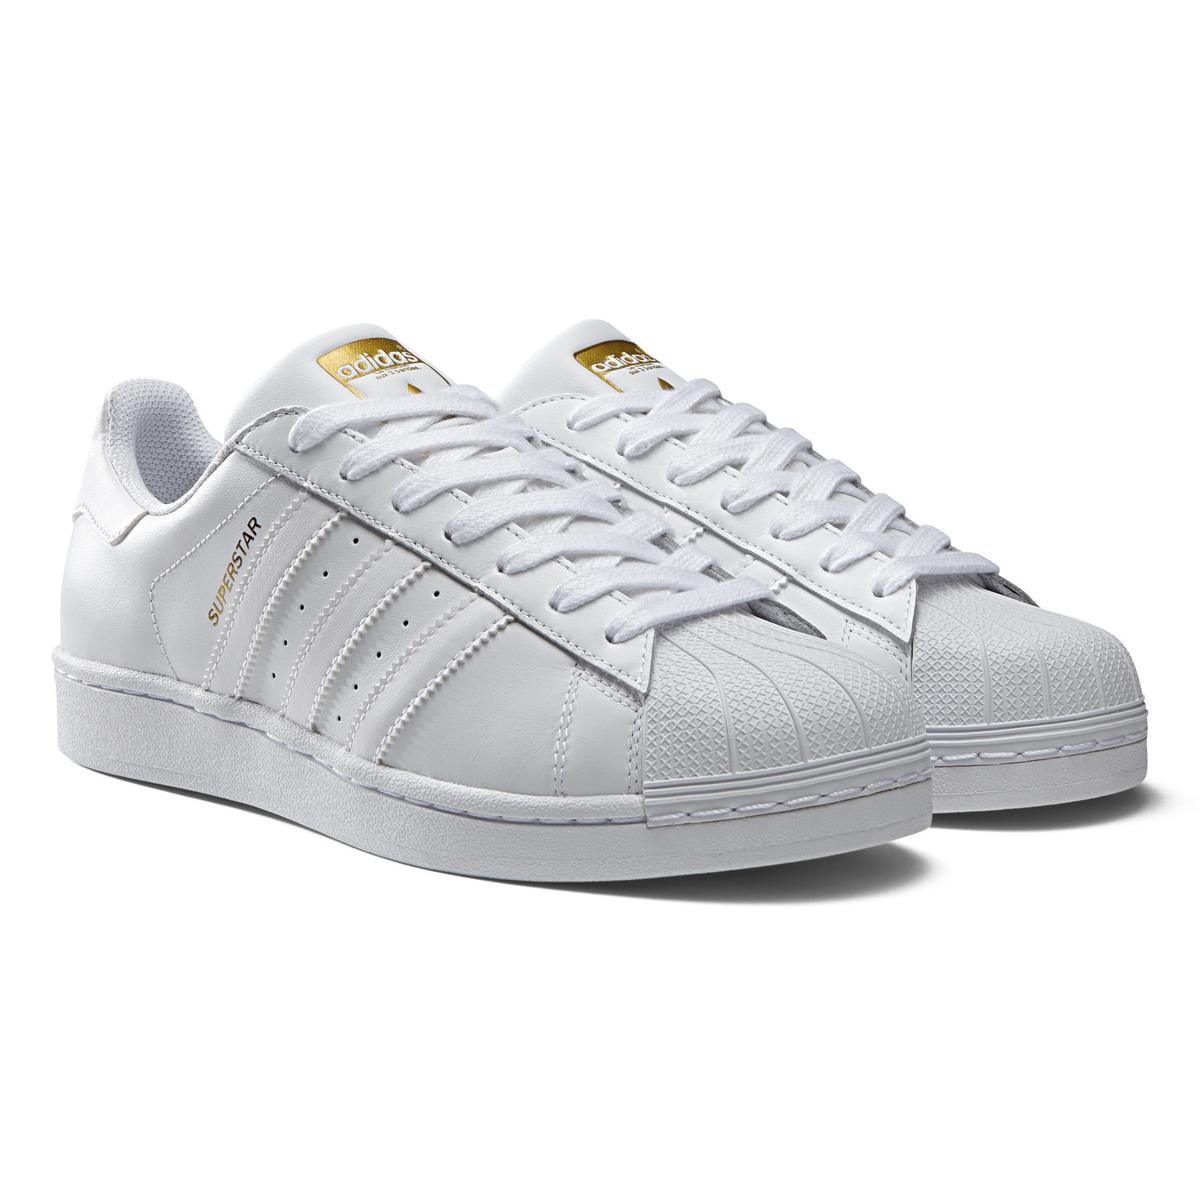 adidas superstar bianca